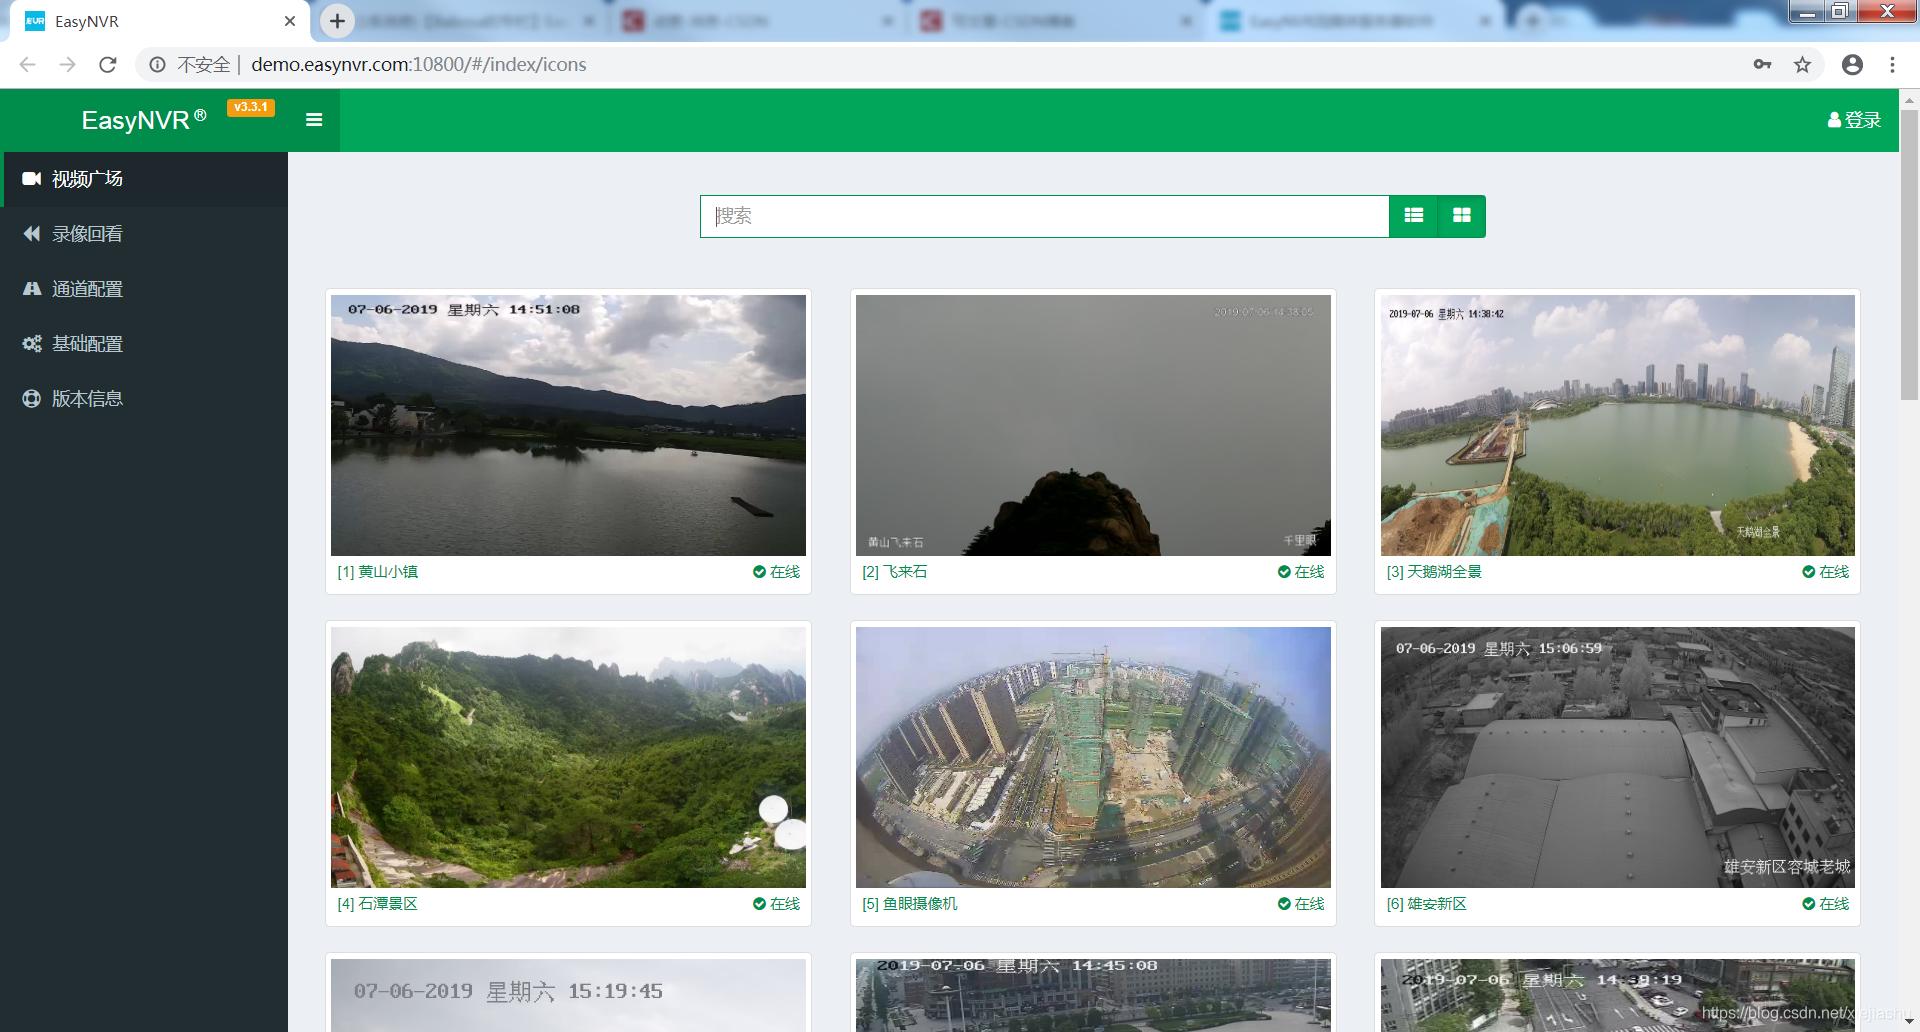 EasyNVR安防视频可视化服务